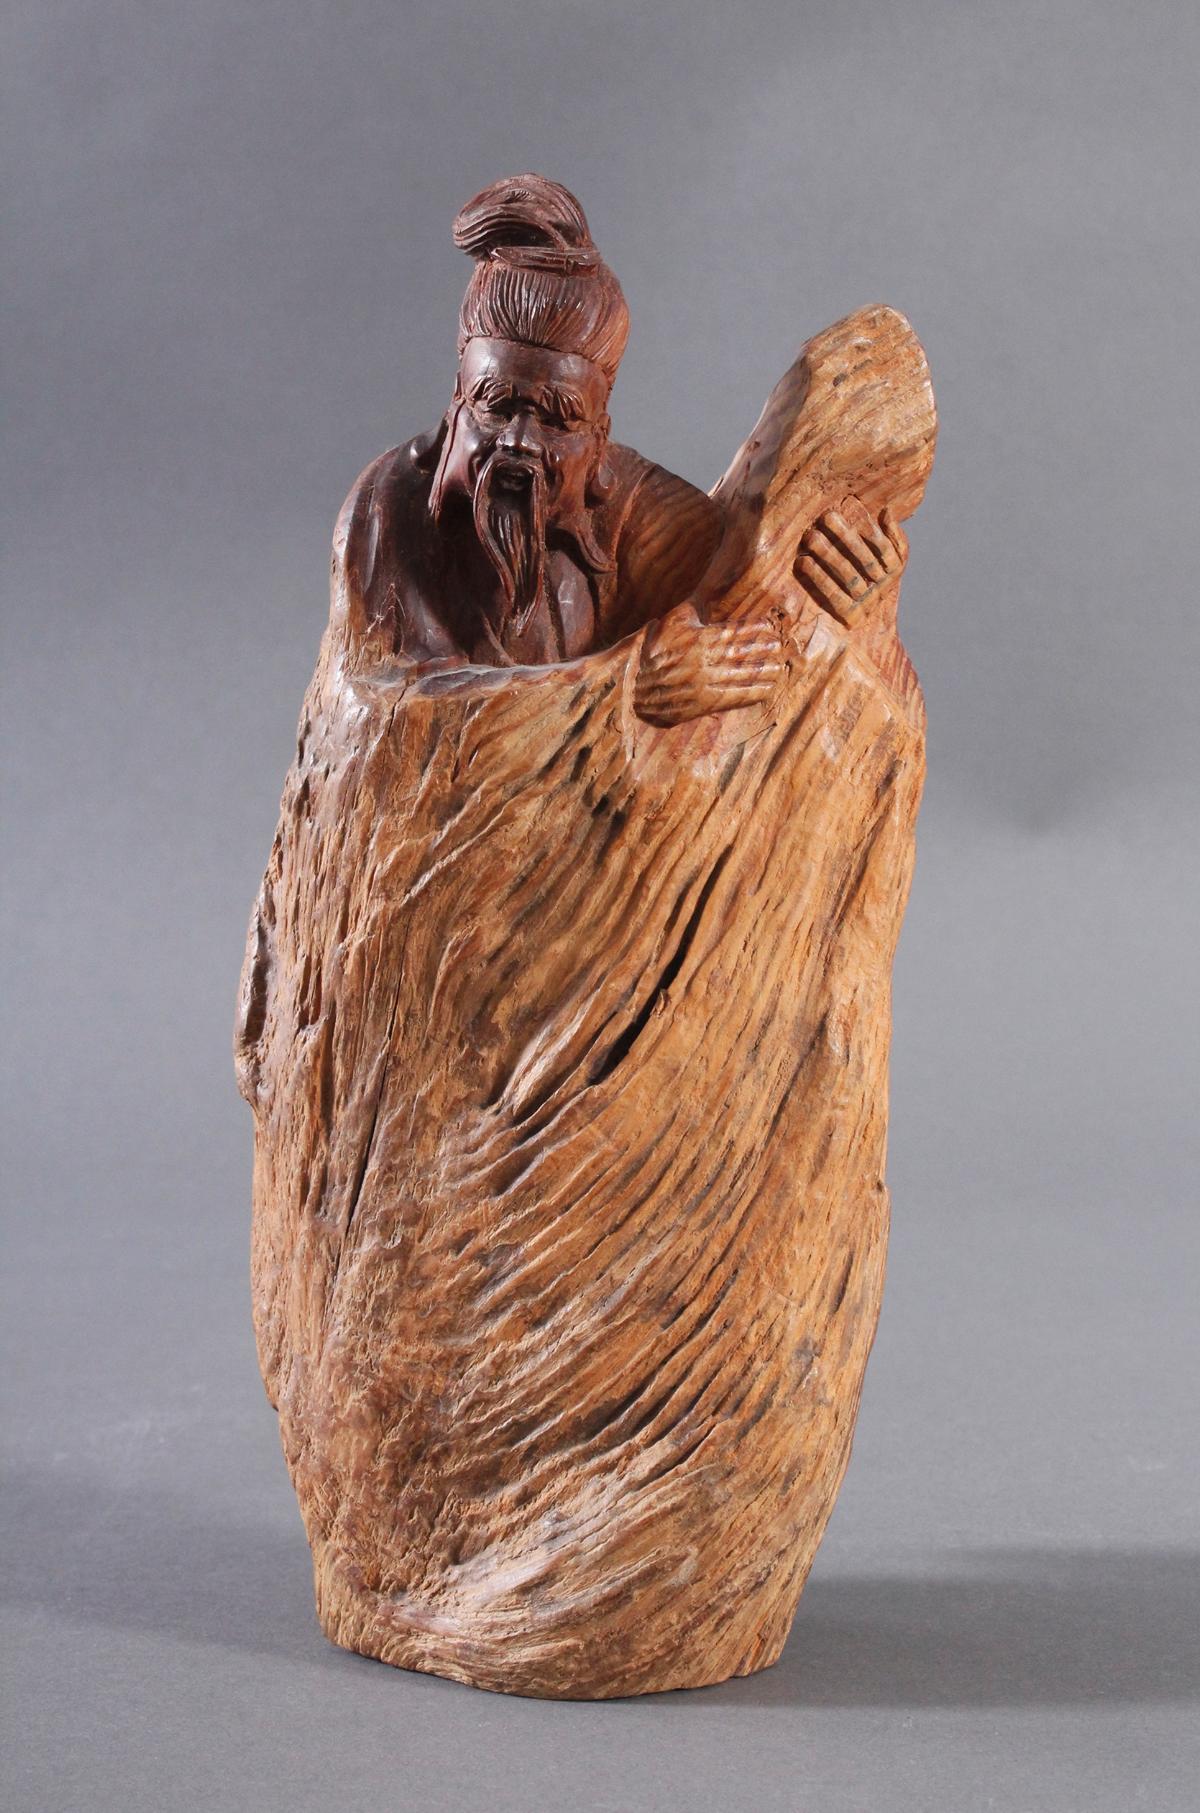 Holzskulptur, China 2. Hälfte 20. Jh. Mann mit Bart